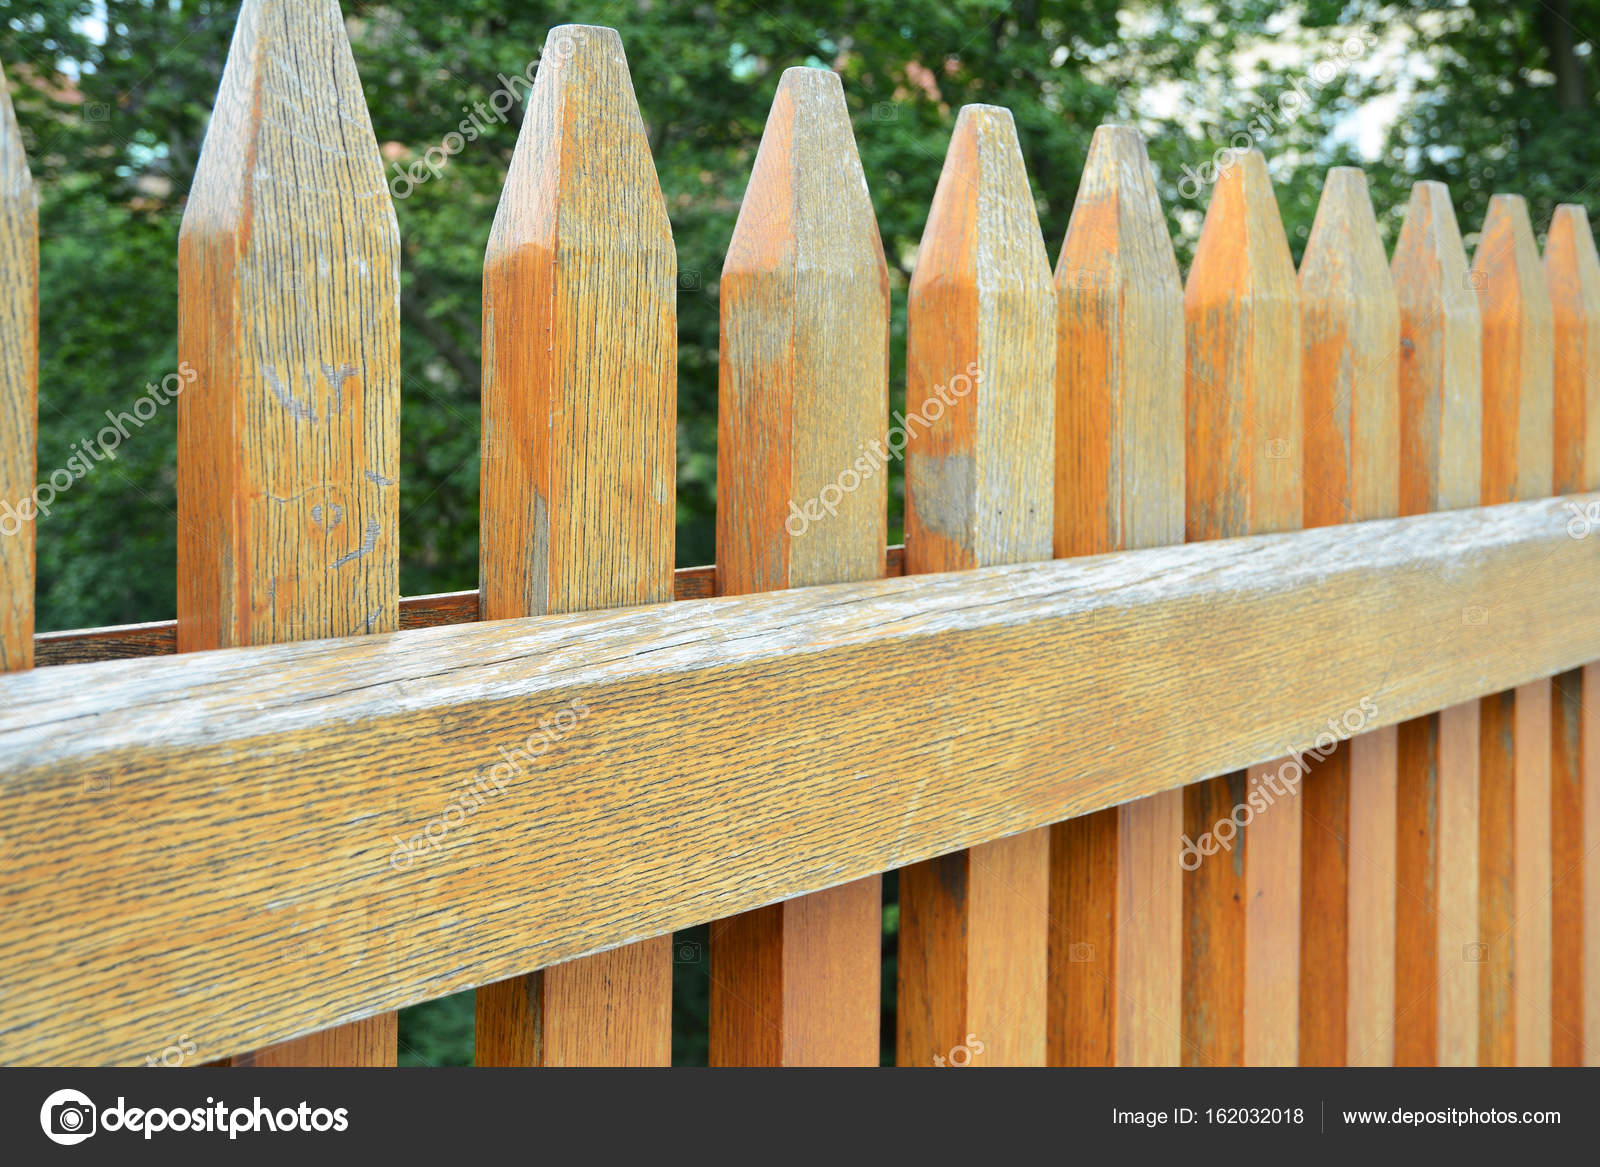 Houten Hekwerk Tuin : Houten hek rondom de tuin close up op houten hek u stockfoto